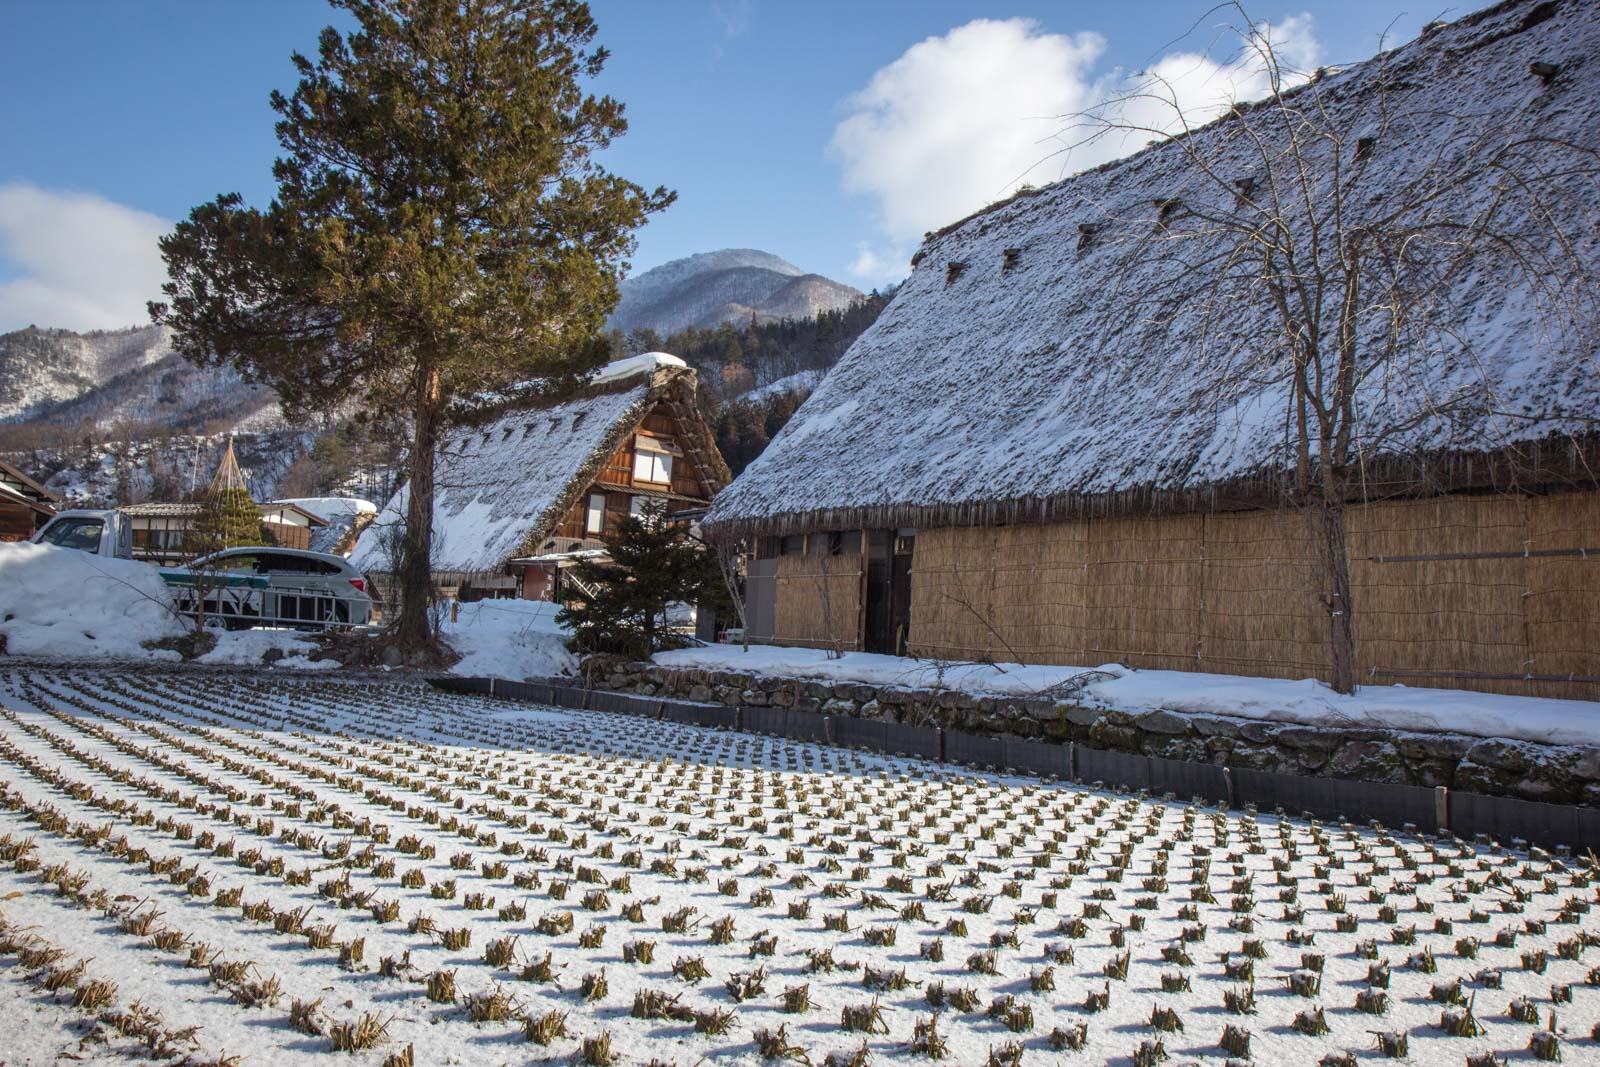 Shirakawa-go village, Japan, World Heritage Site